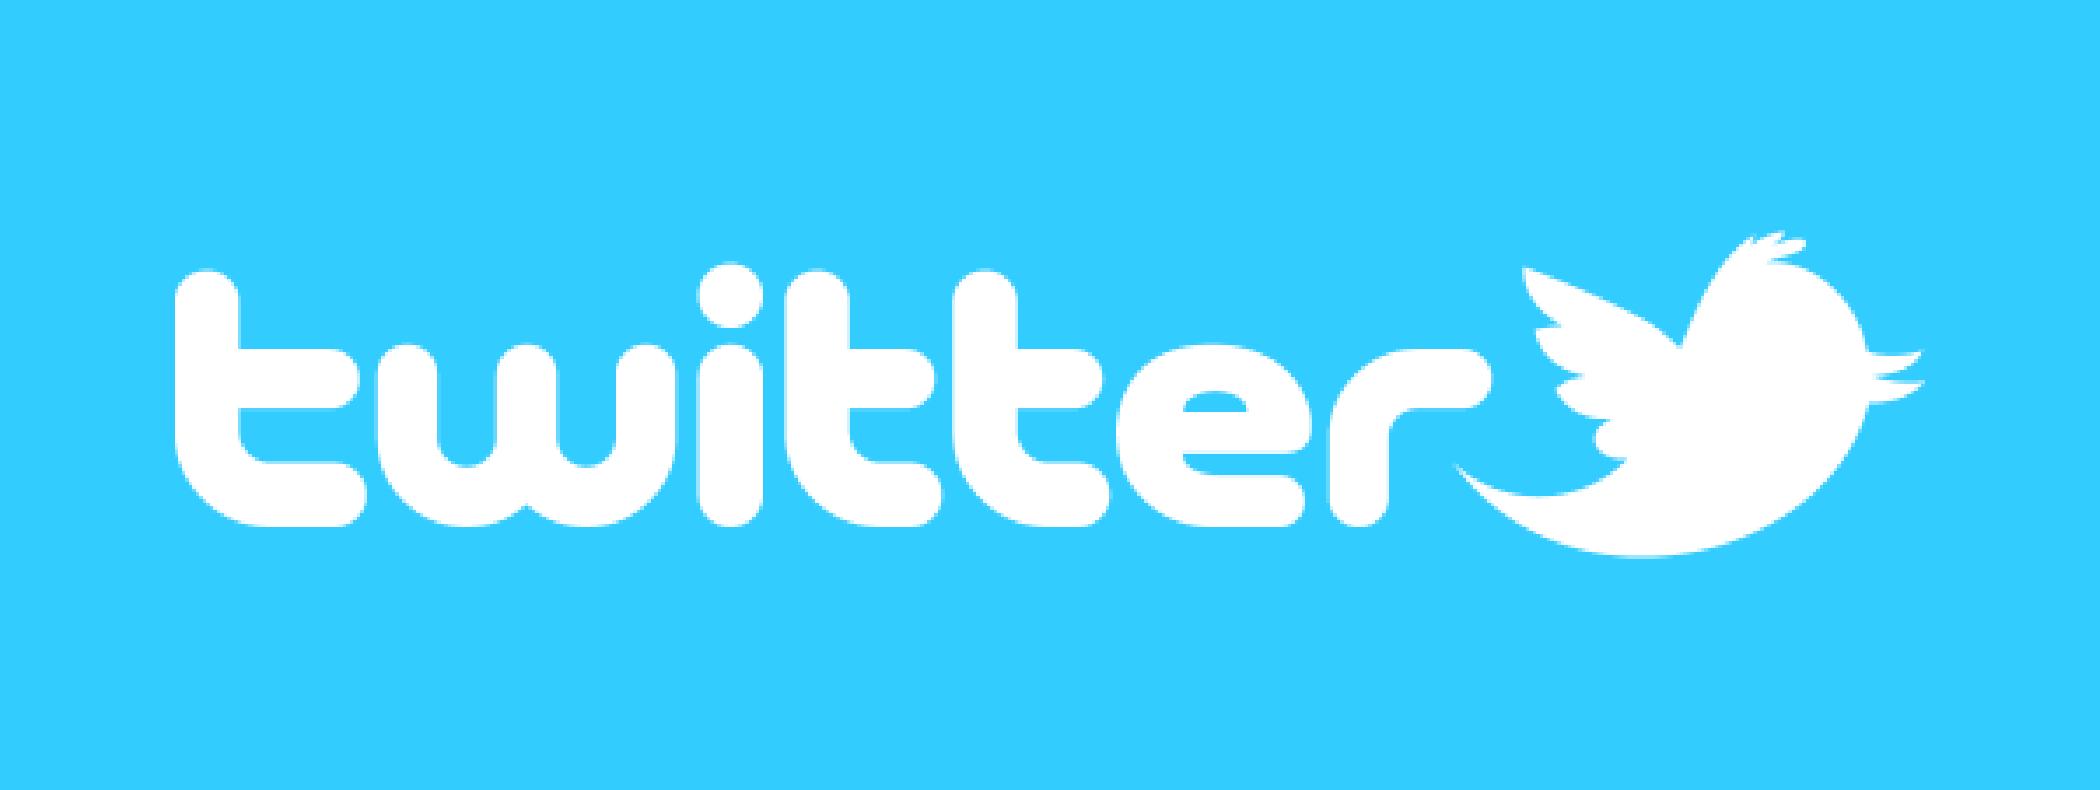 twitter-logo-hd-png-06.jpg.png